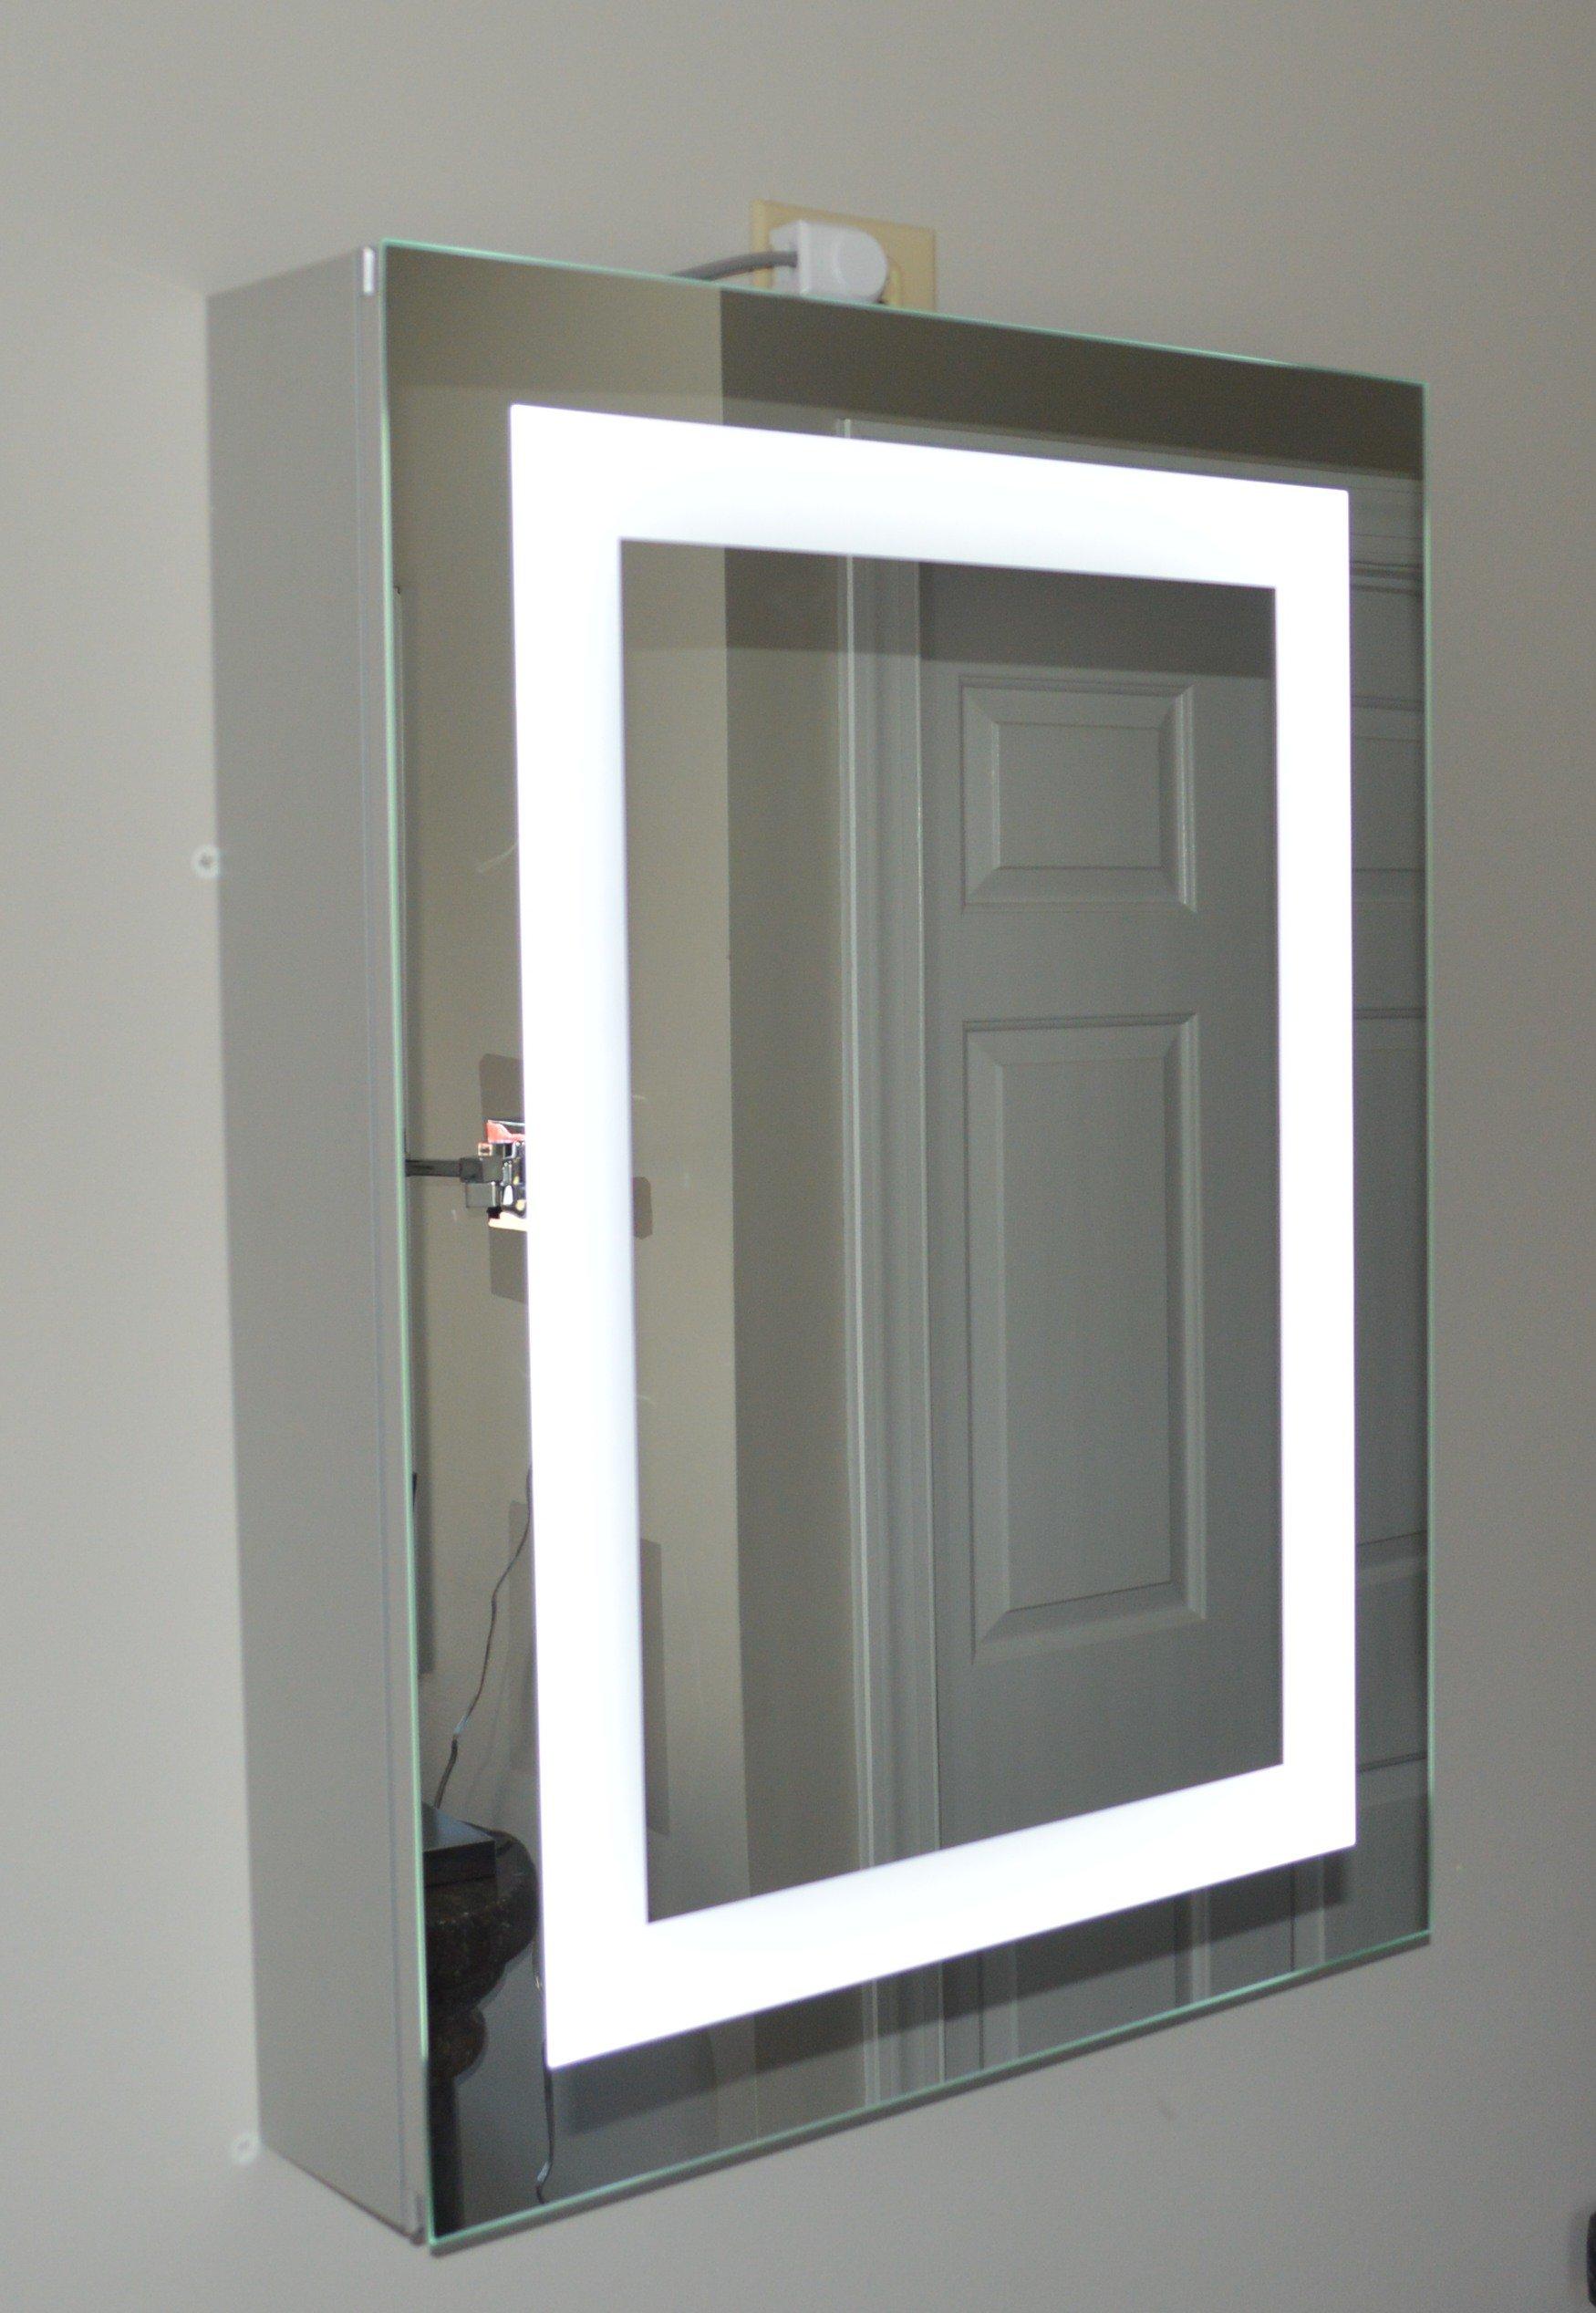 Lighted Medicine Cabinet - 24''w x 32''t - lighted door - commercial grade